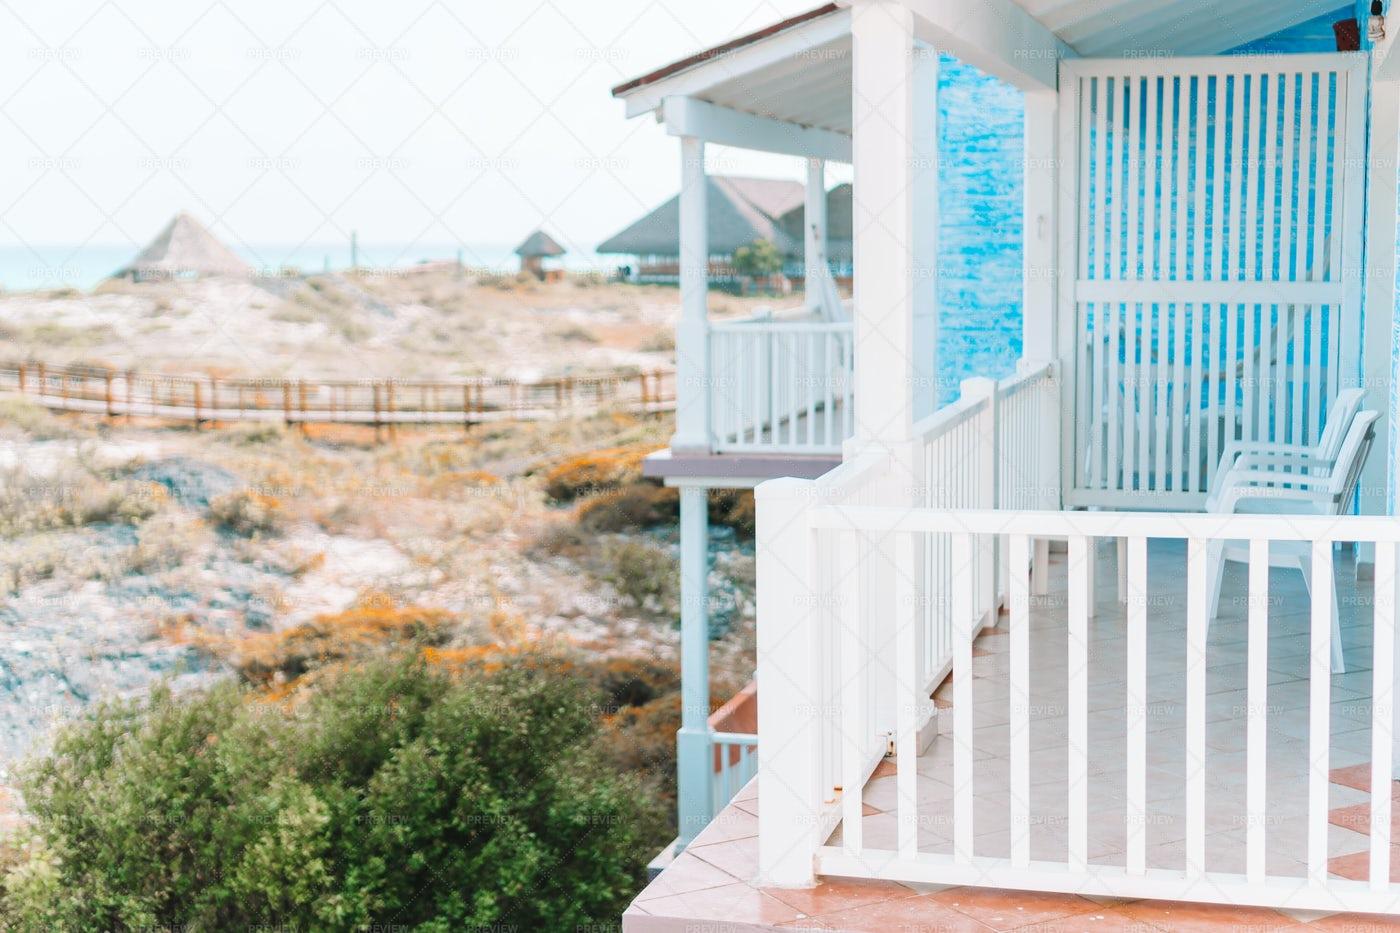 Beach House Patio: Stock Photos